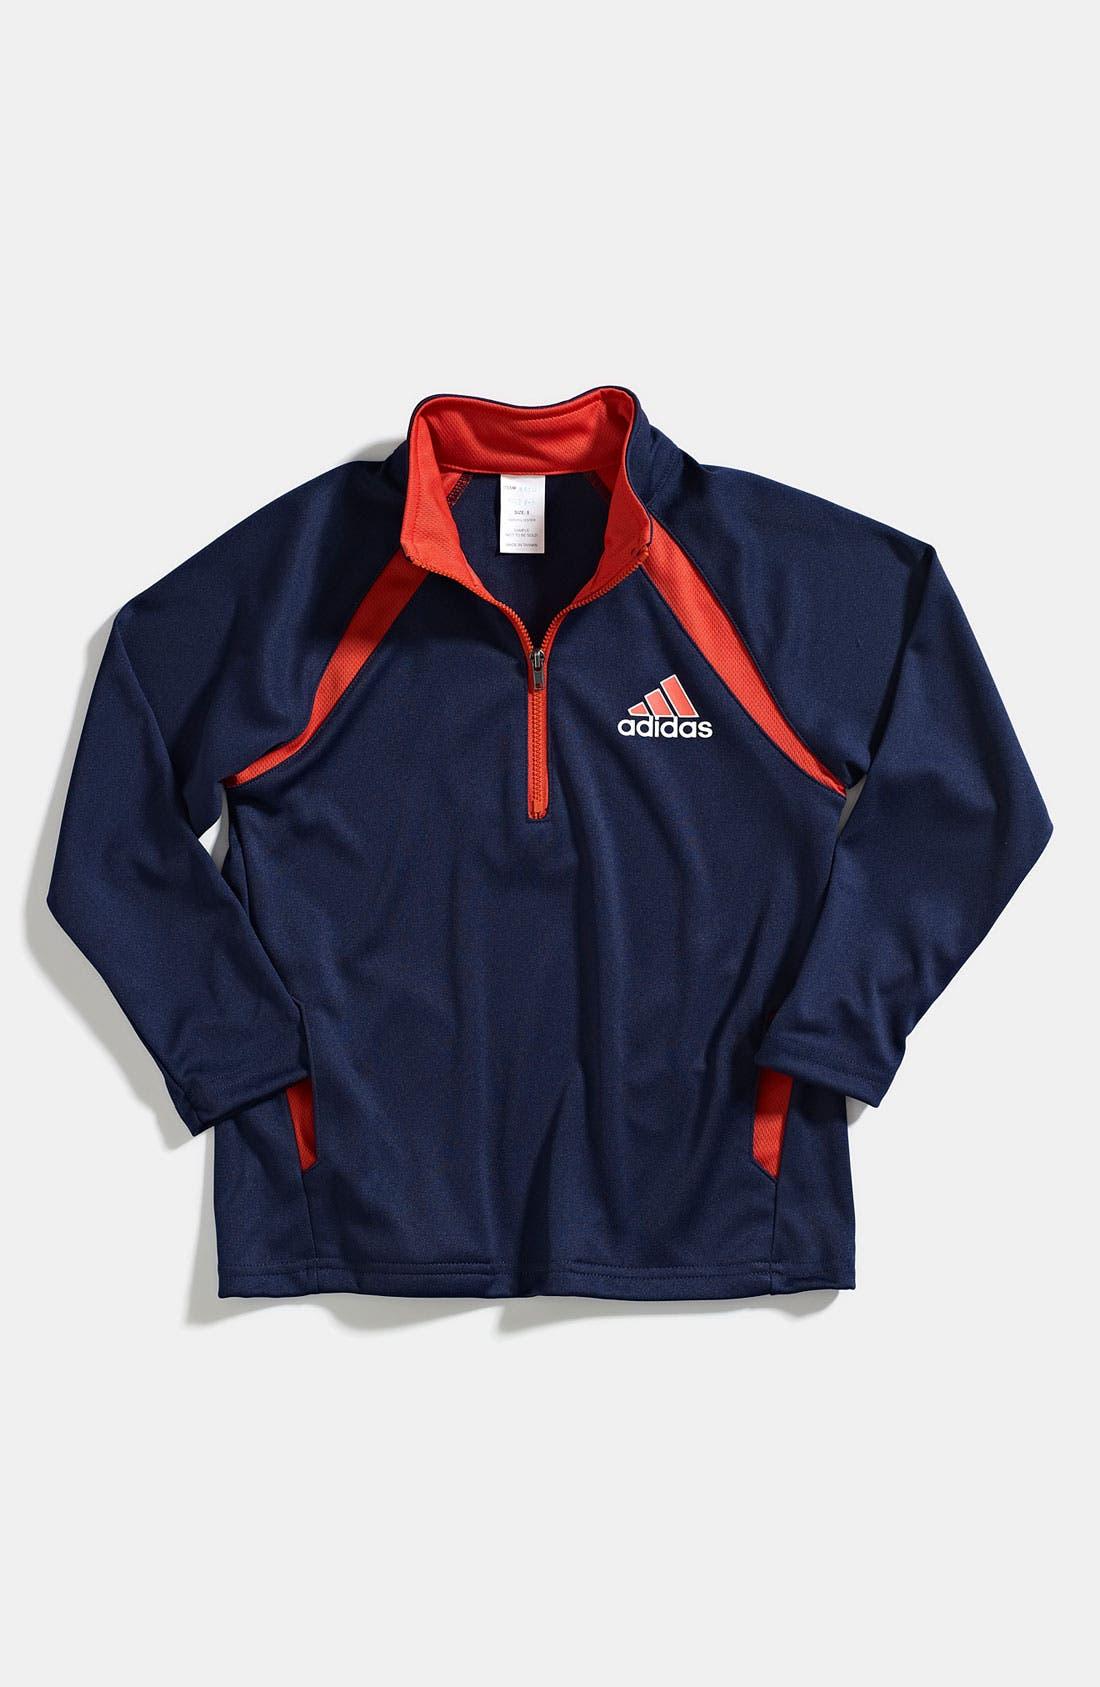 Main Image - adidas Tech Jacket (Little Boys)